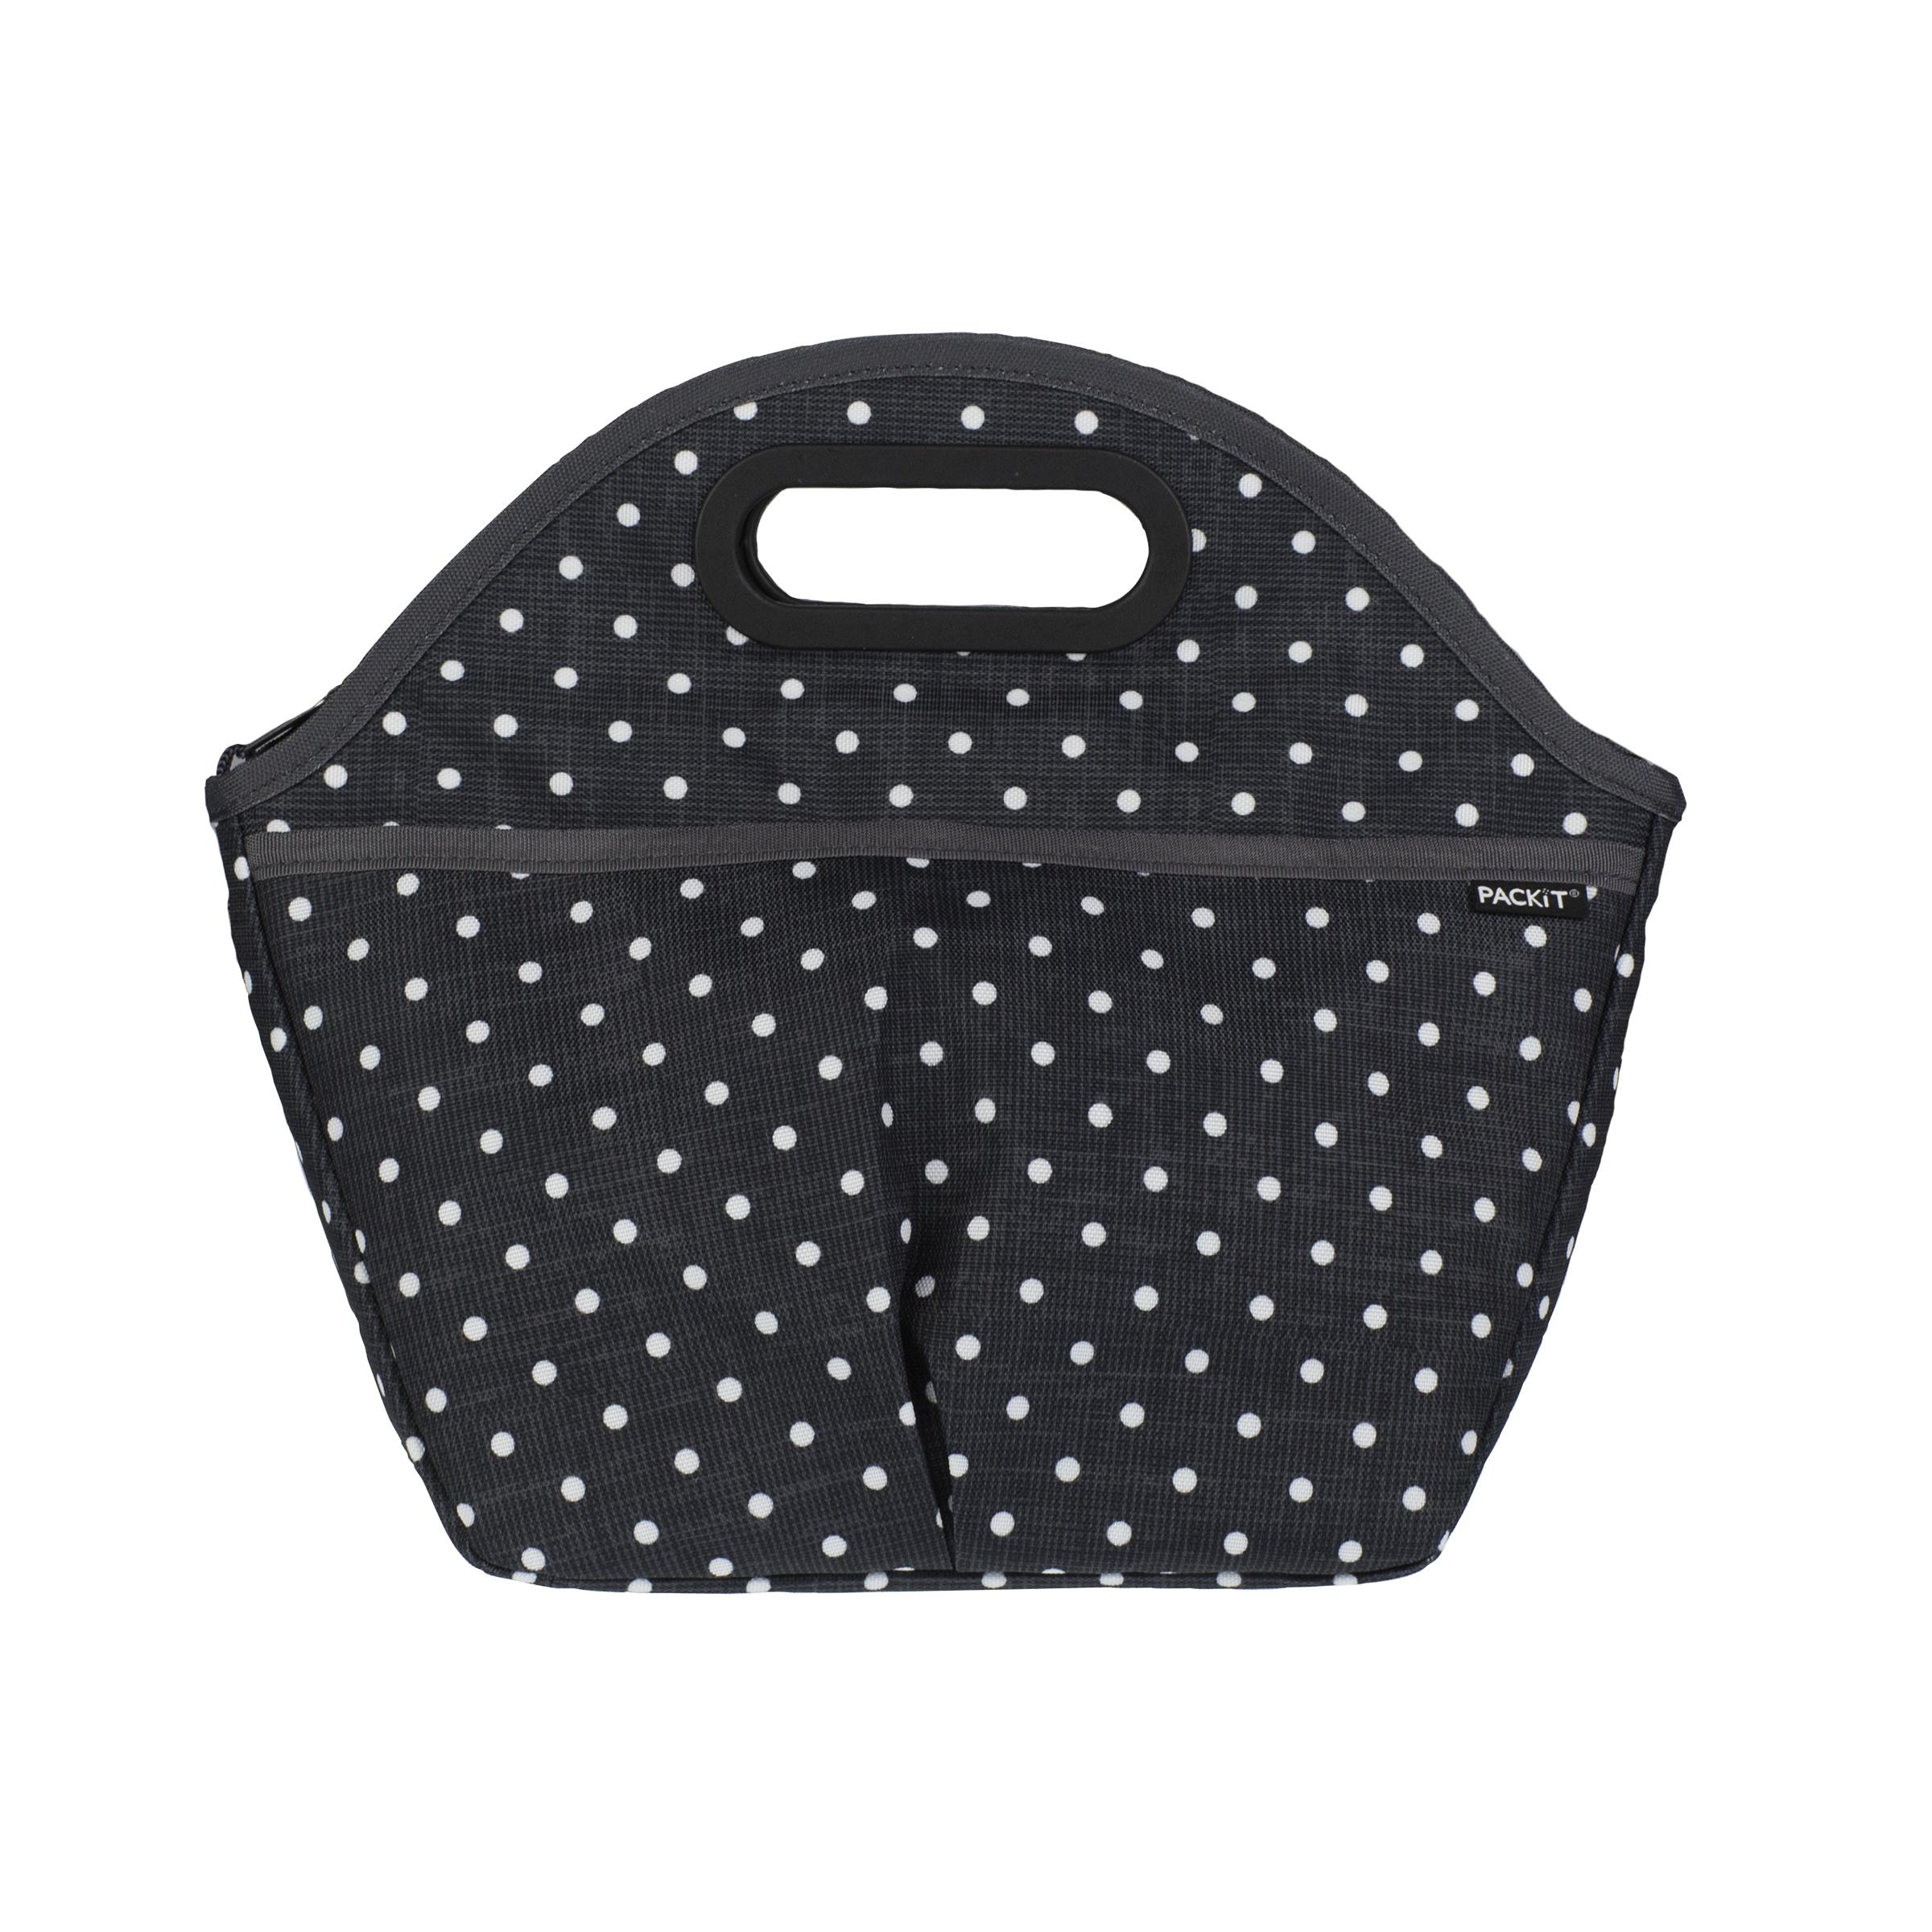 Geanta frigorifica Packit, Polka Dots, 5 L